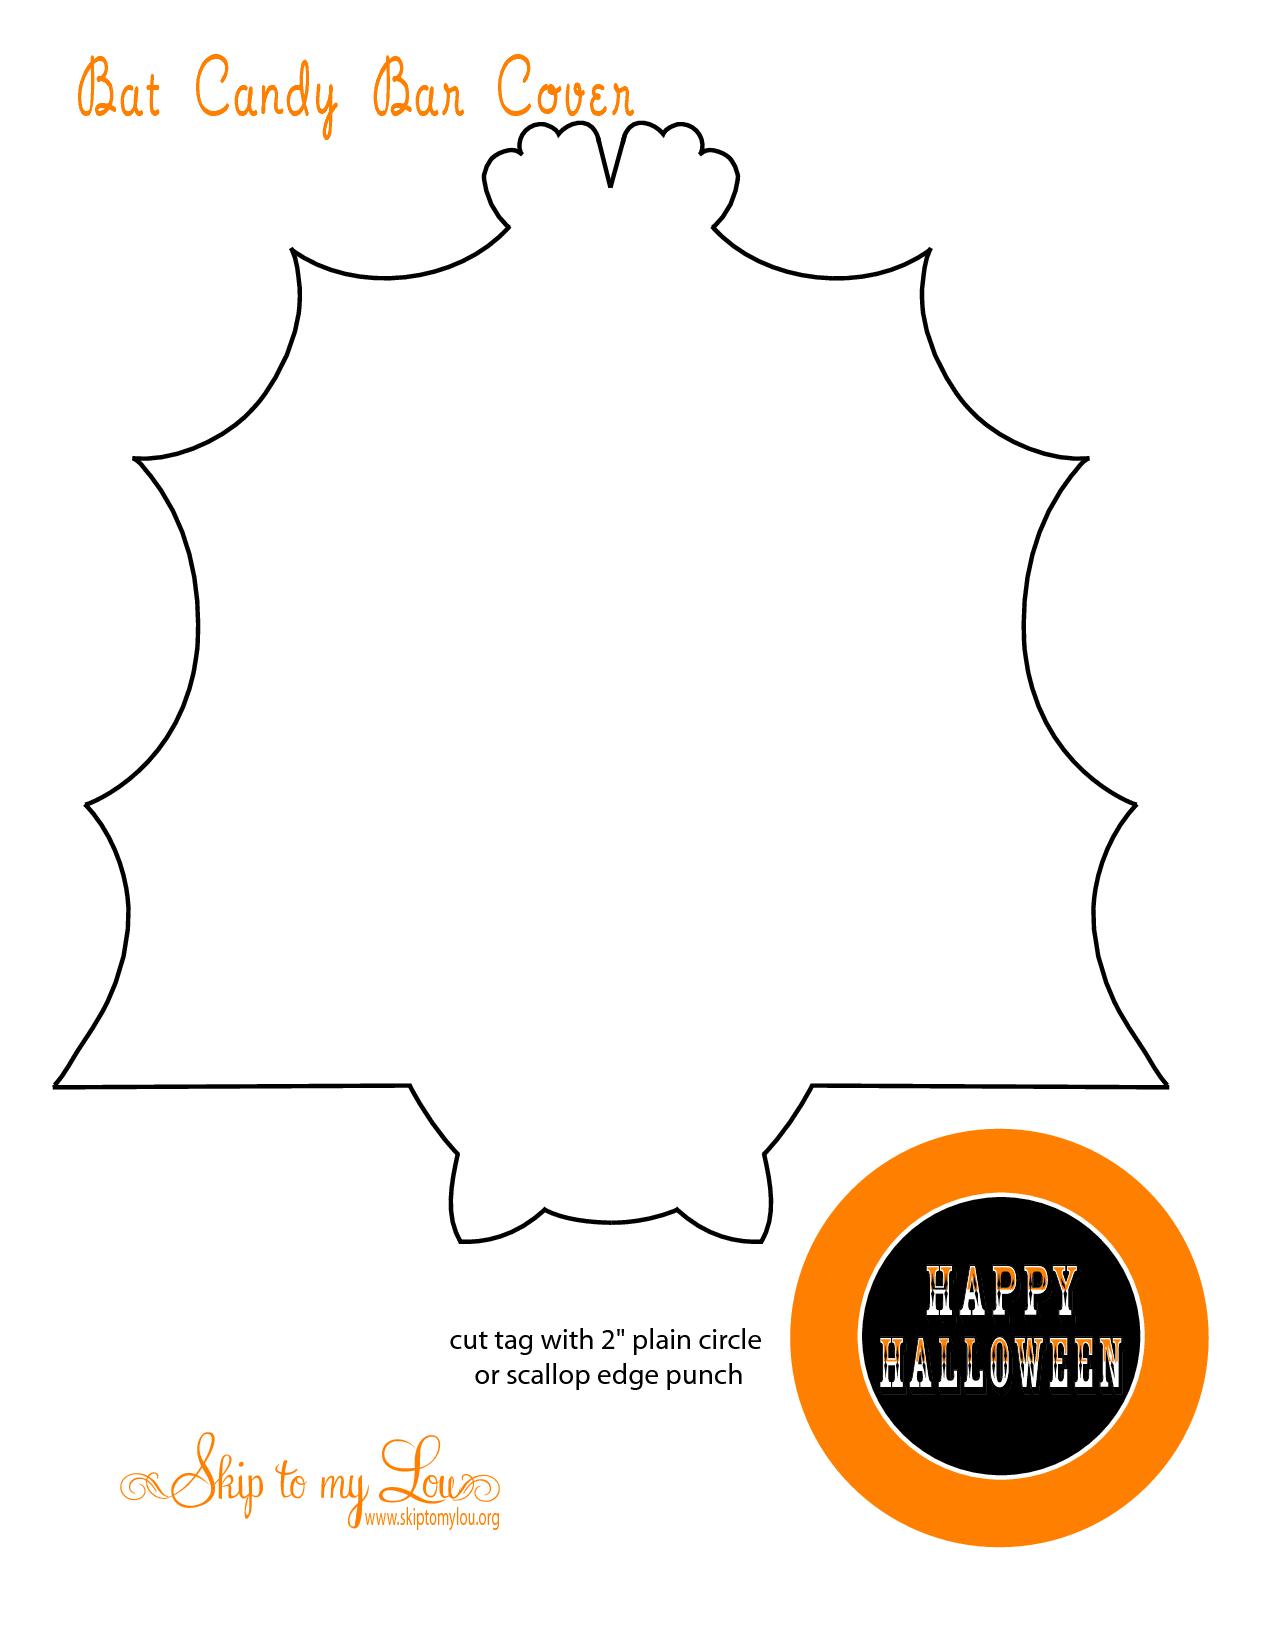 bat candy bar wrapper template ideal vistalist co